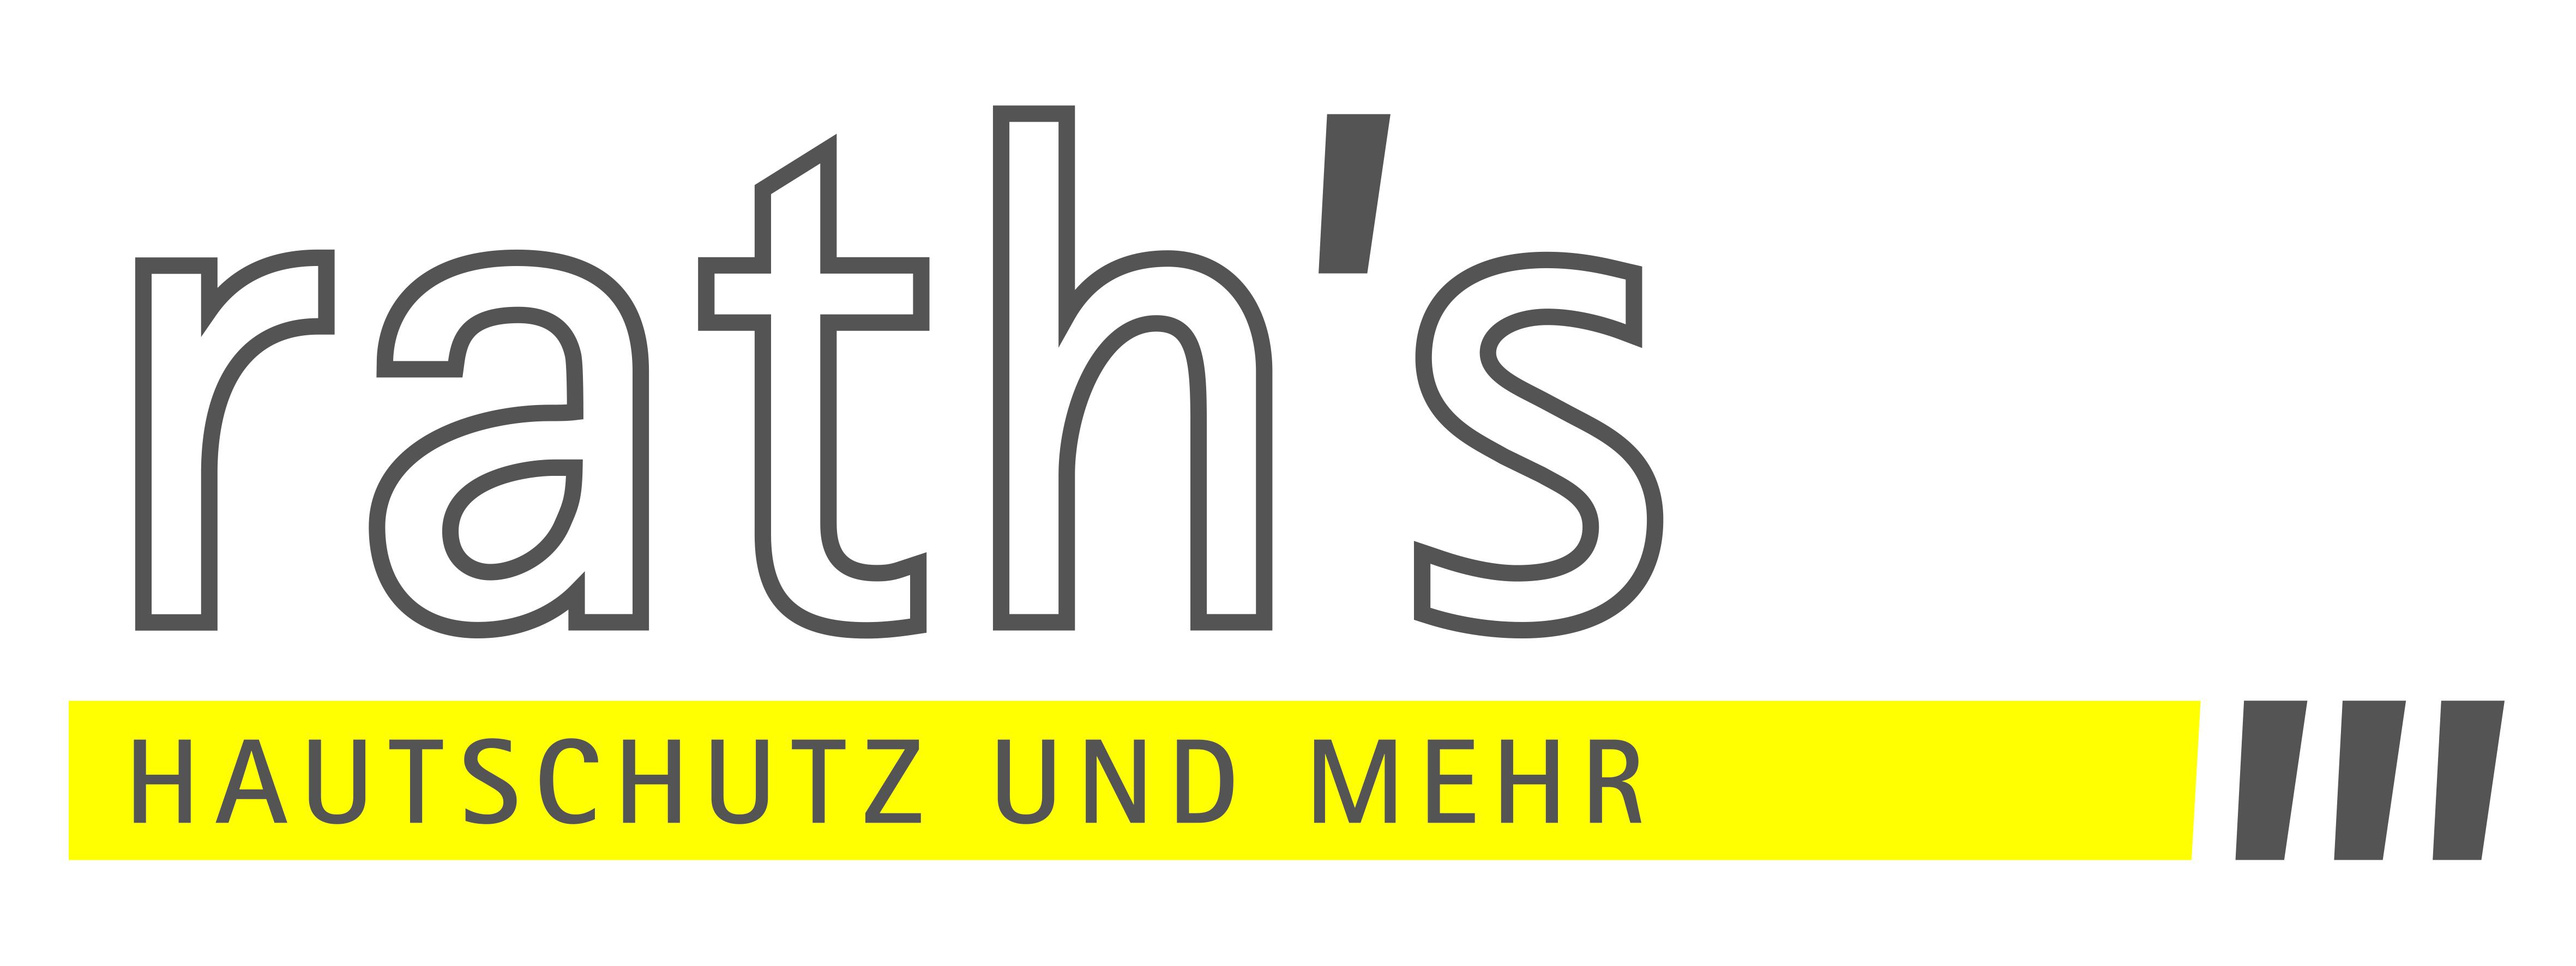 Ursula Rath GmbH